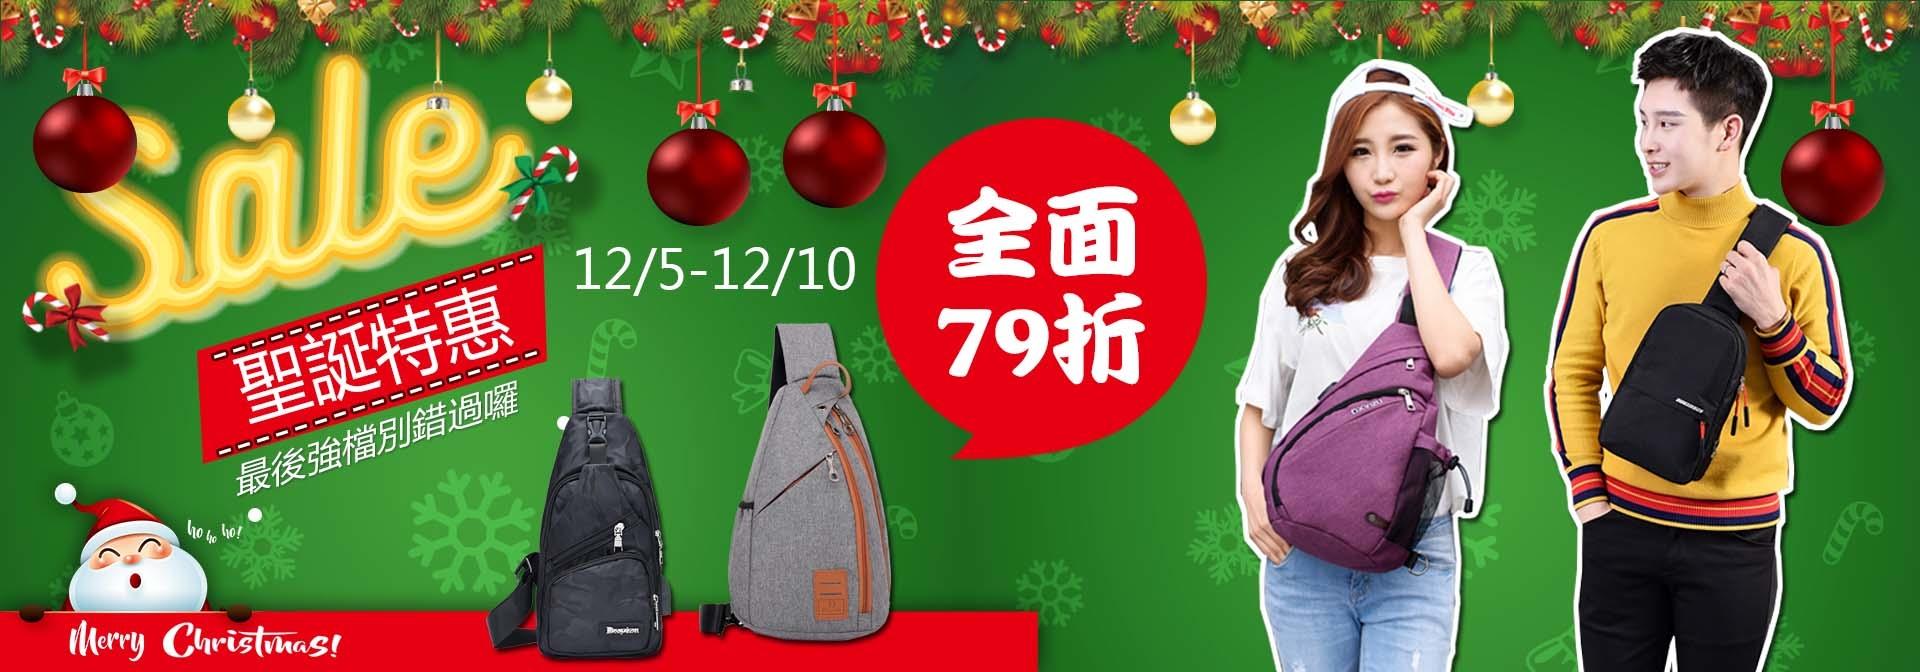 UTmall聖誕優惠胸包全面79折